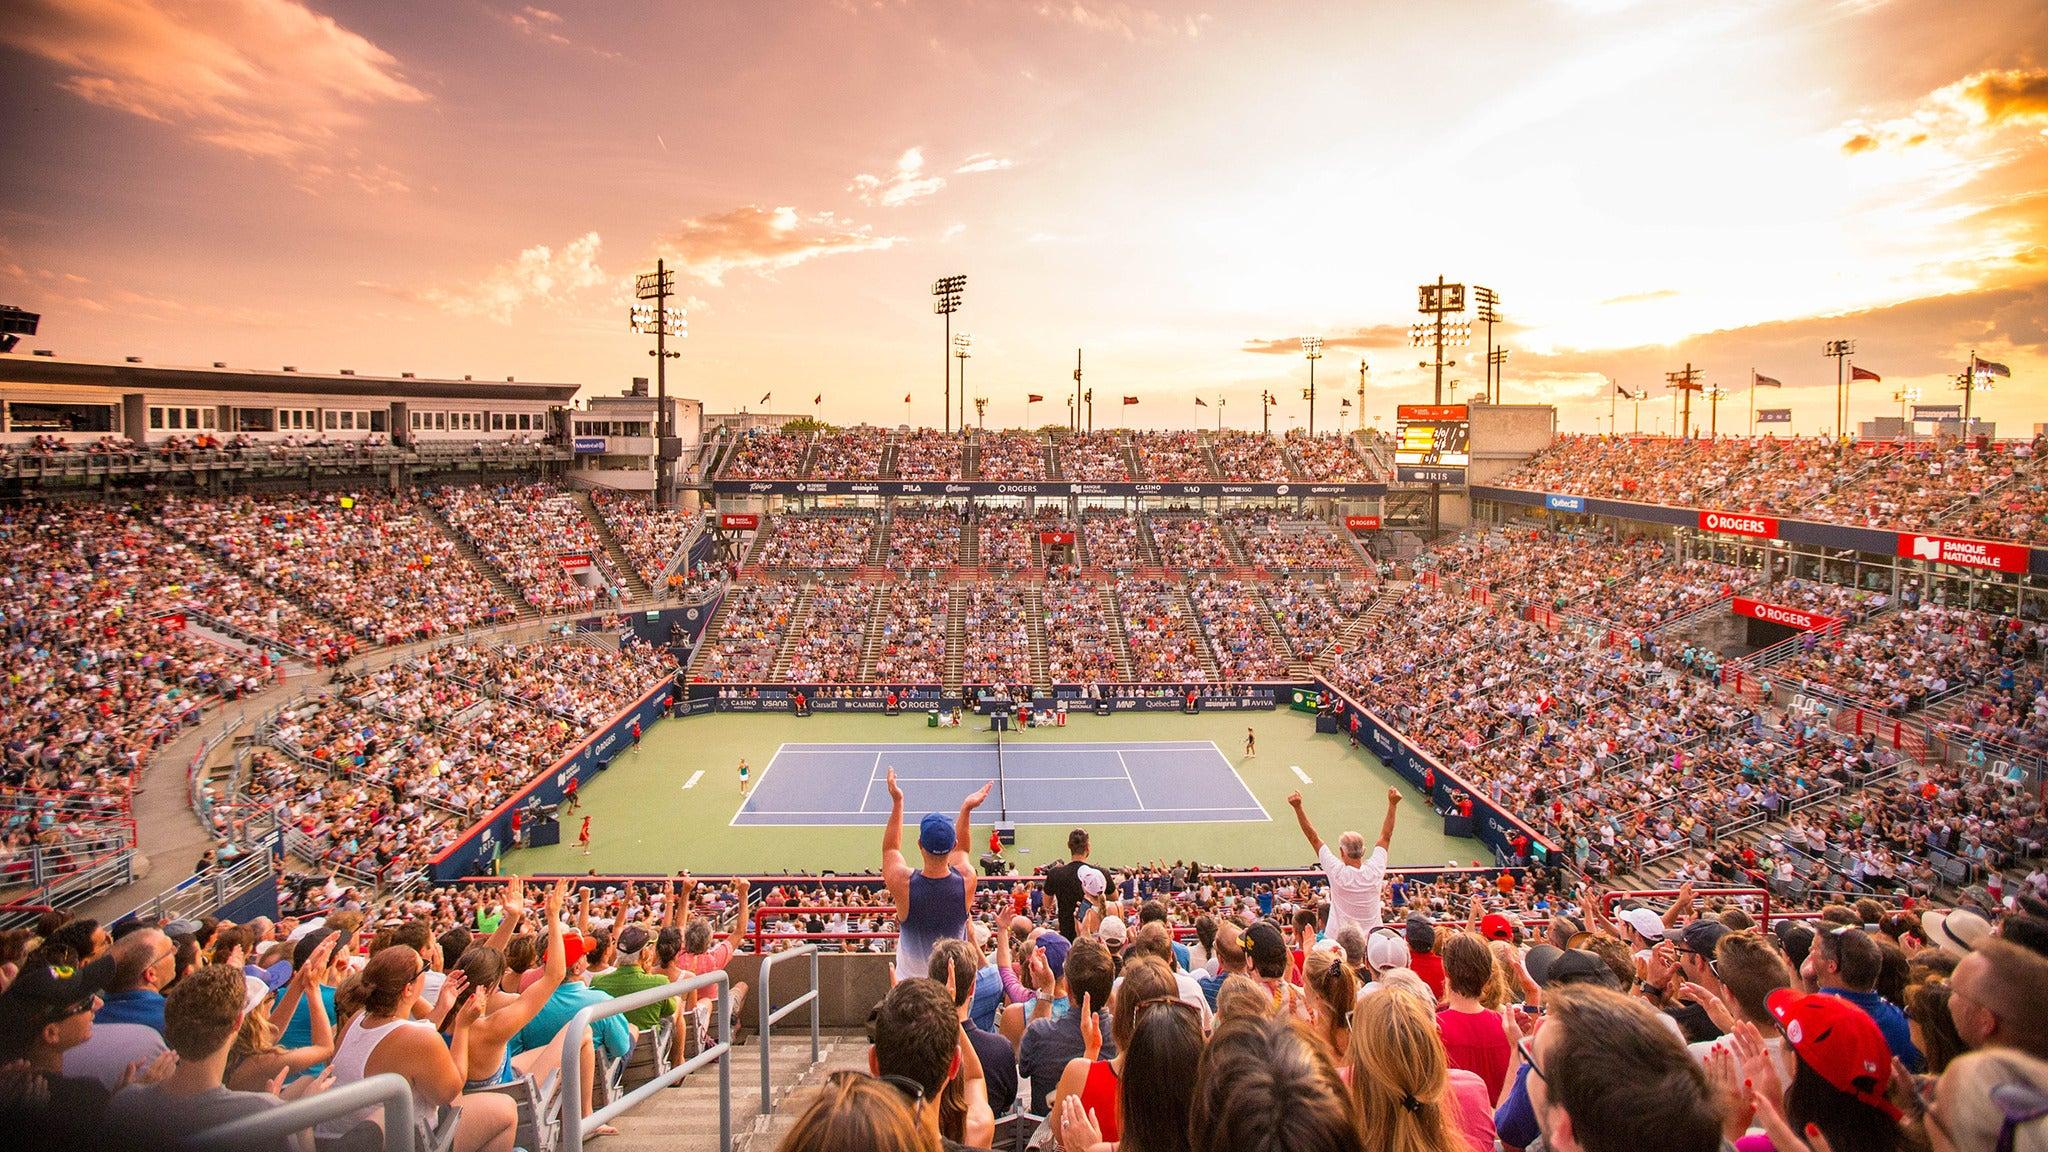 Rogers Cup – WTA Women's Tennis